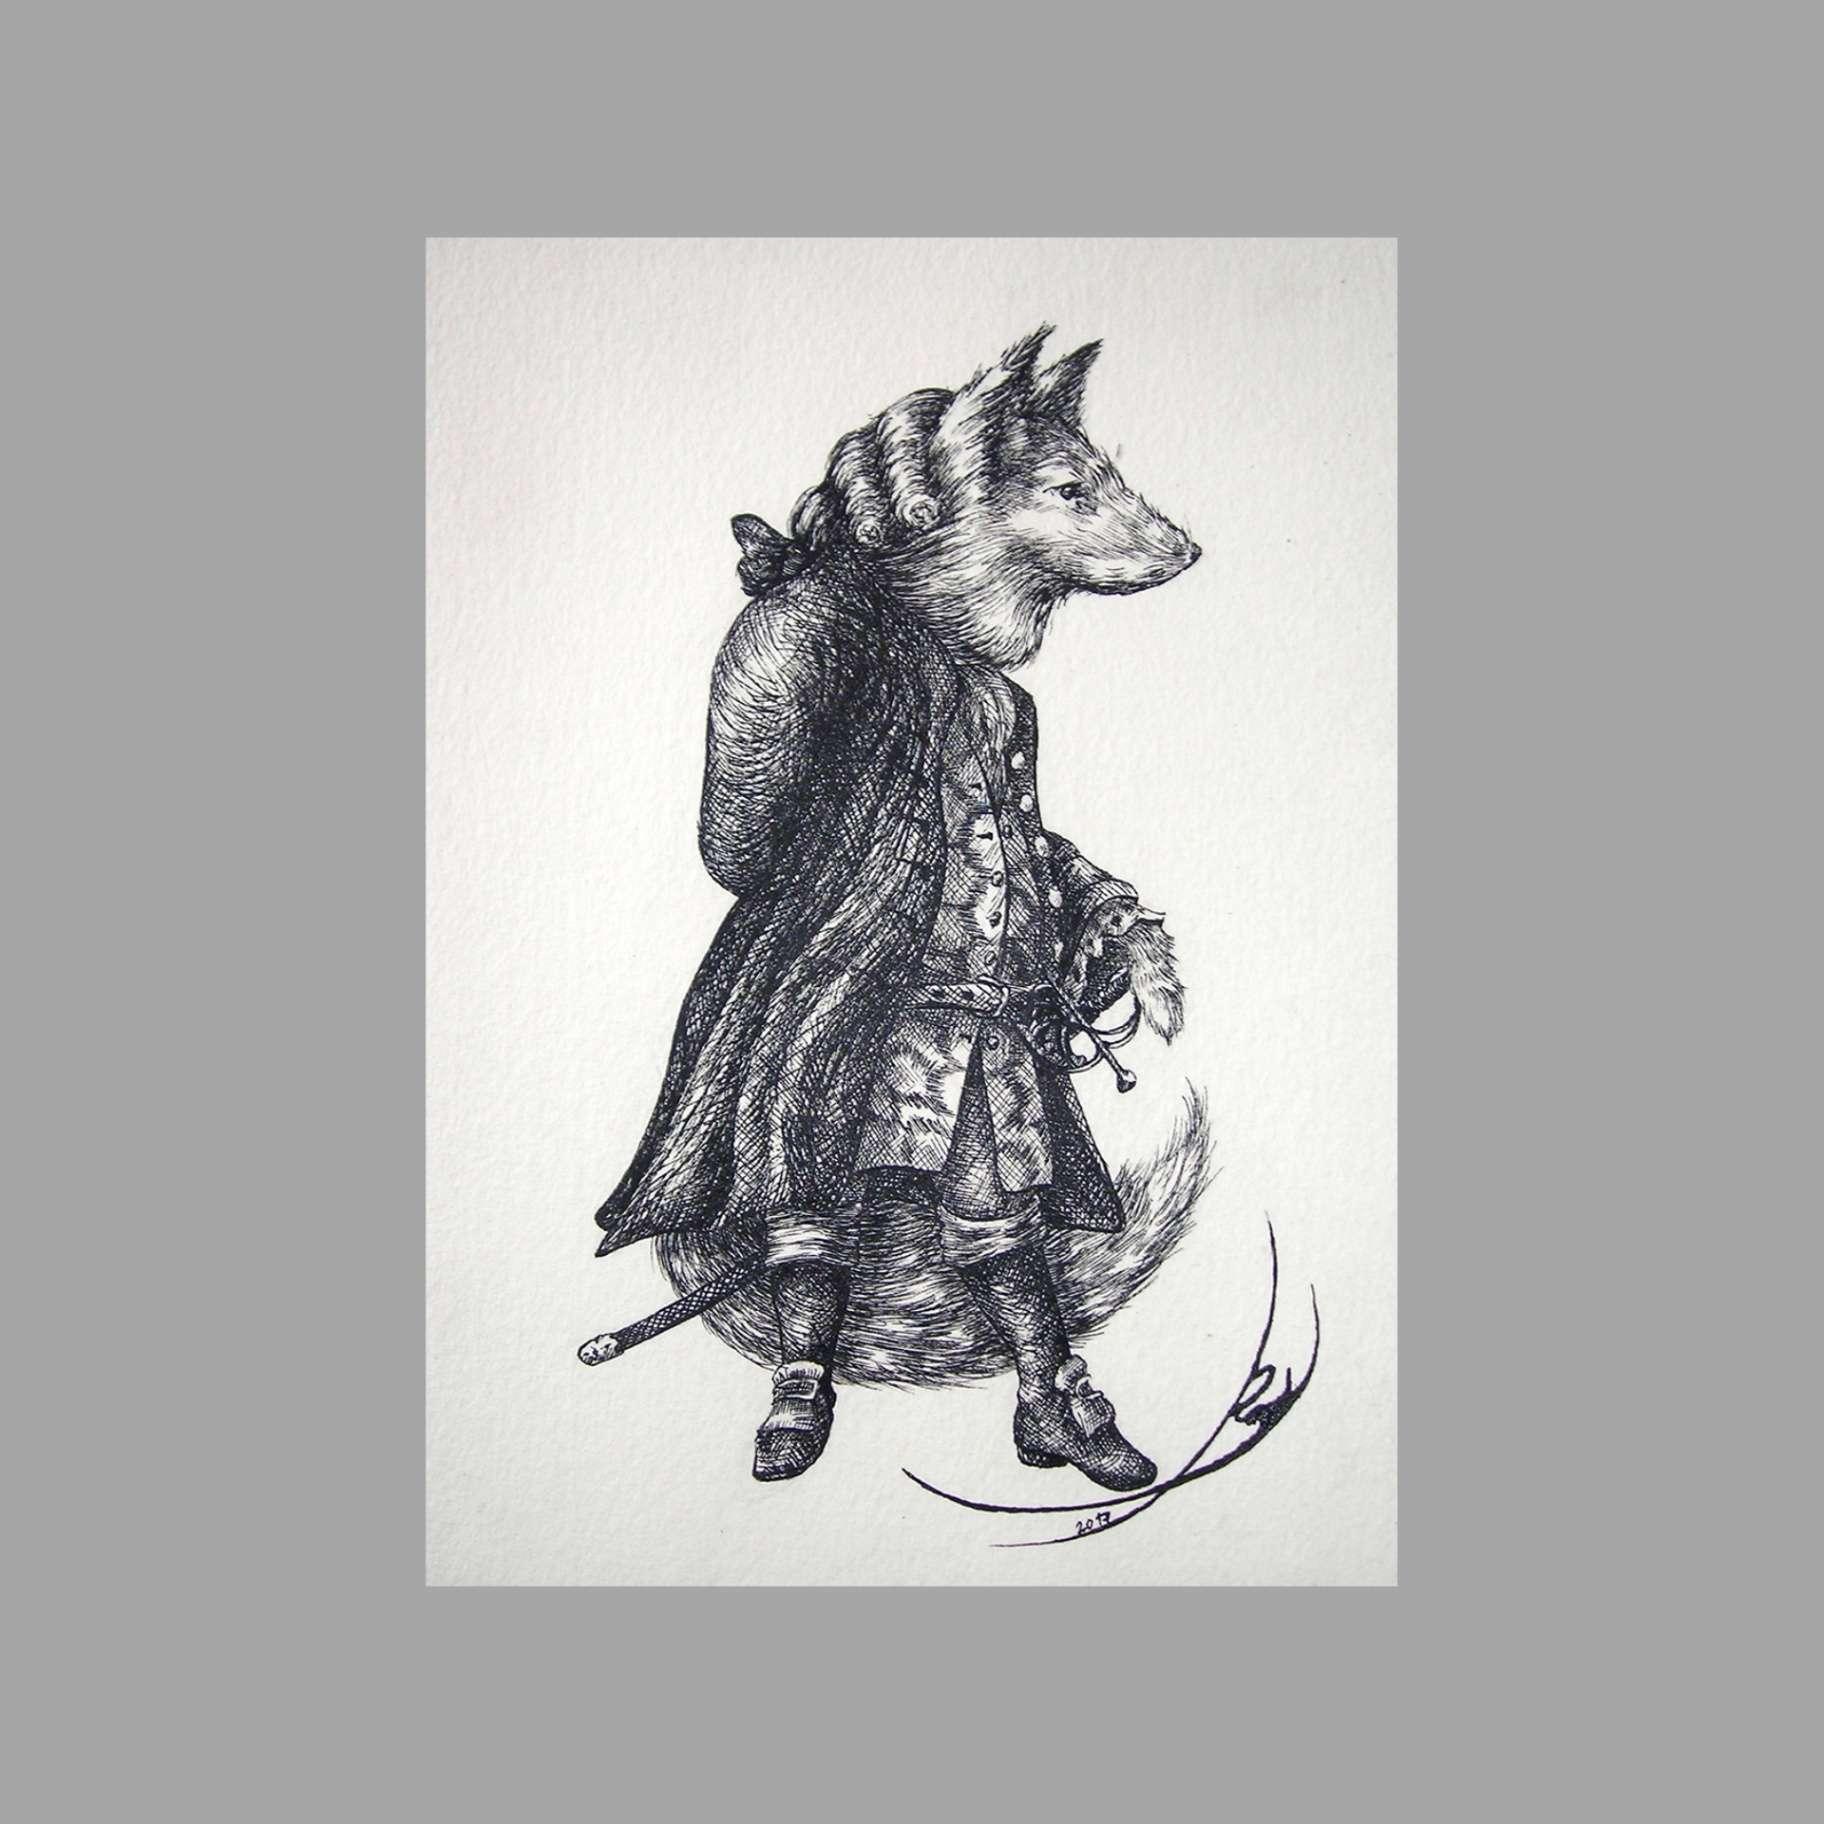 Obra: Sir Foxhead